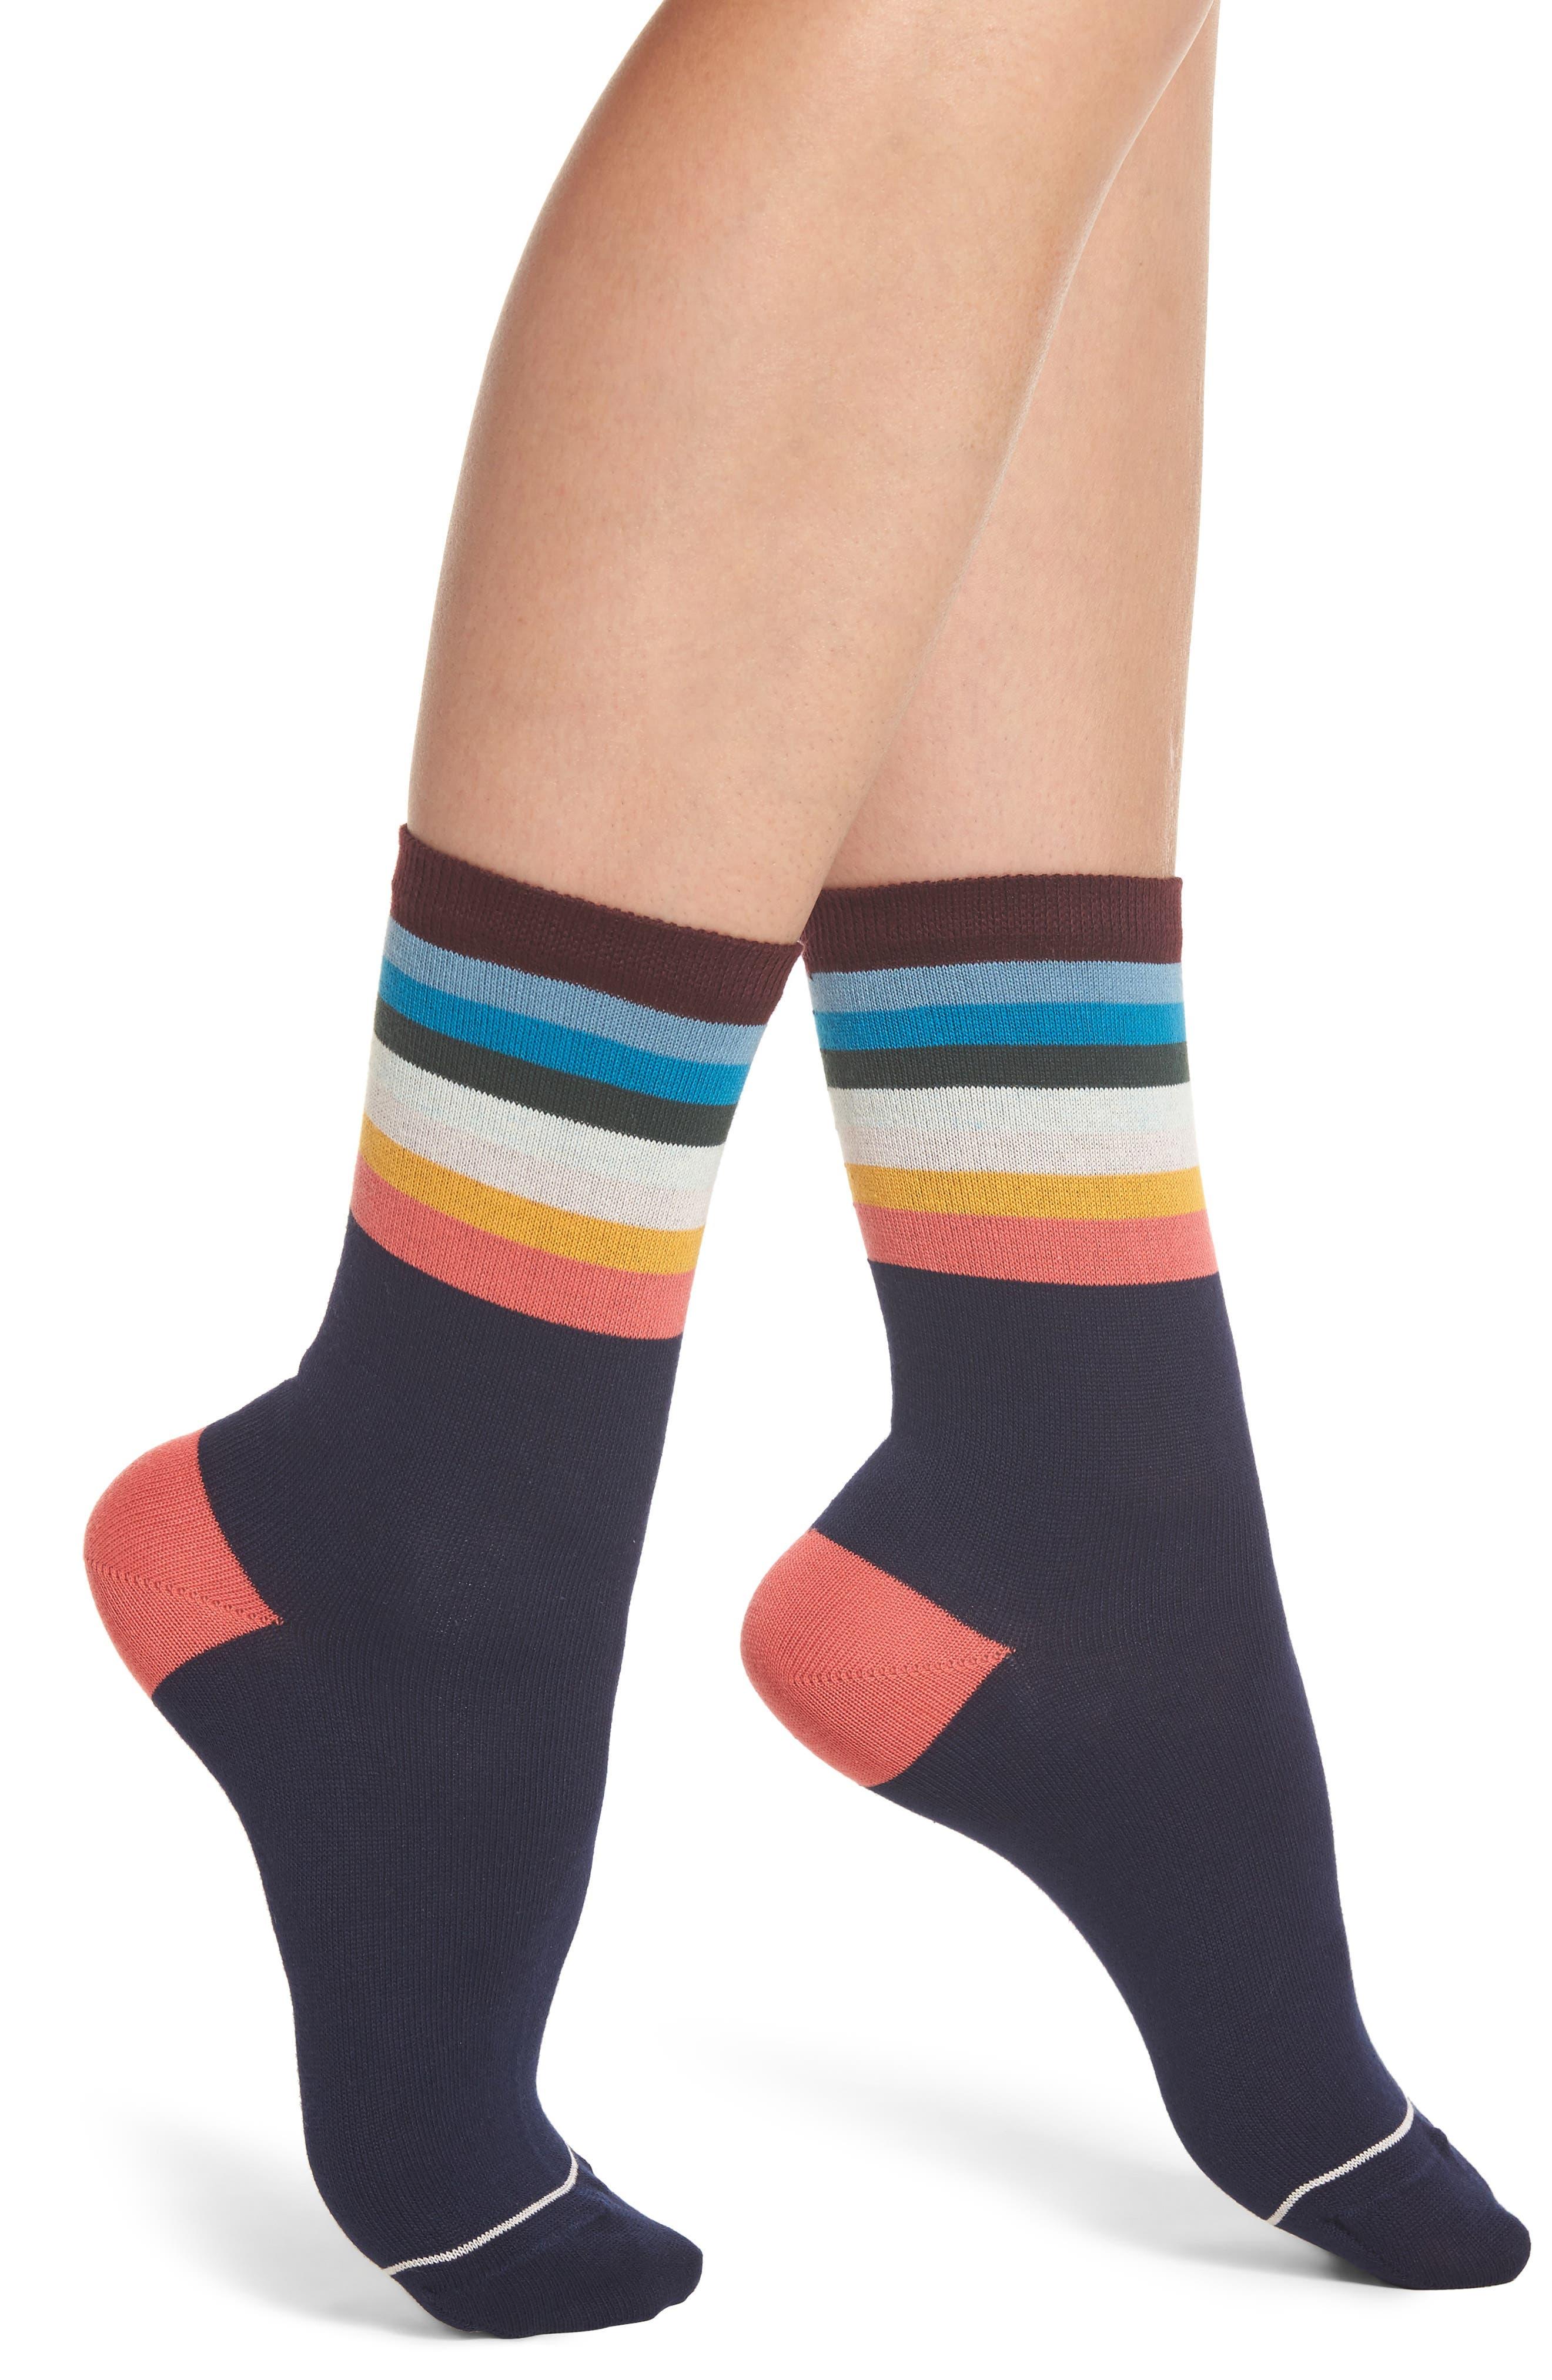 Cindy Artist Stripe Ankle Socks,                         Main,                         color, 415